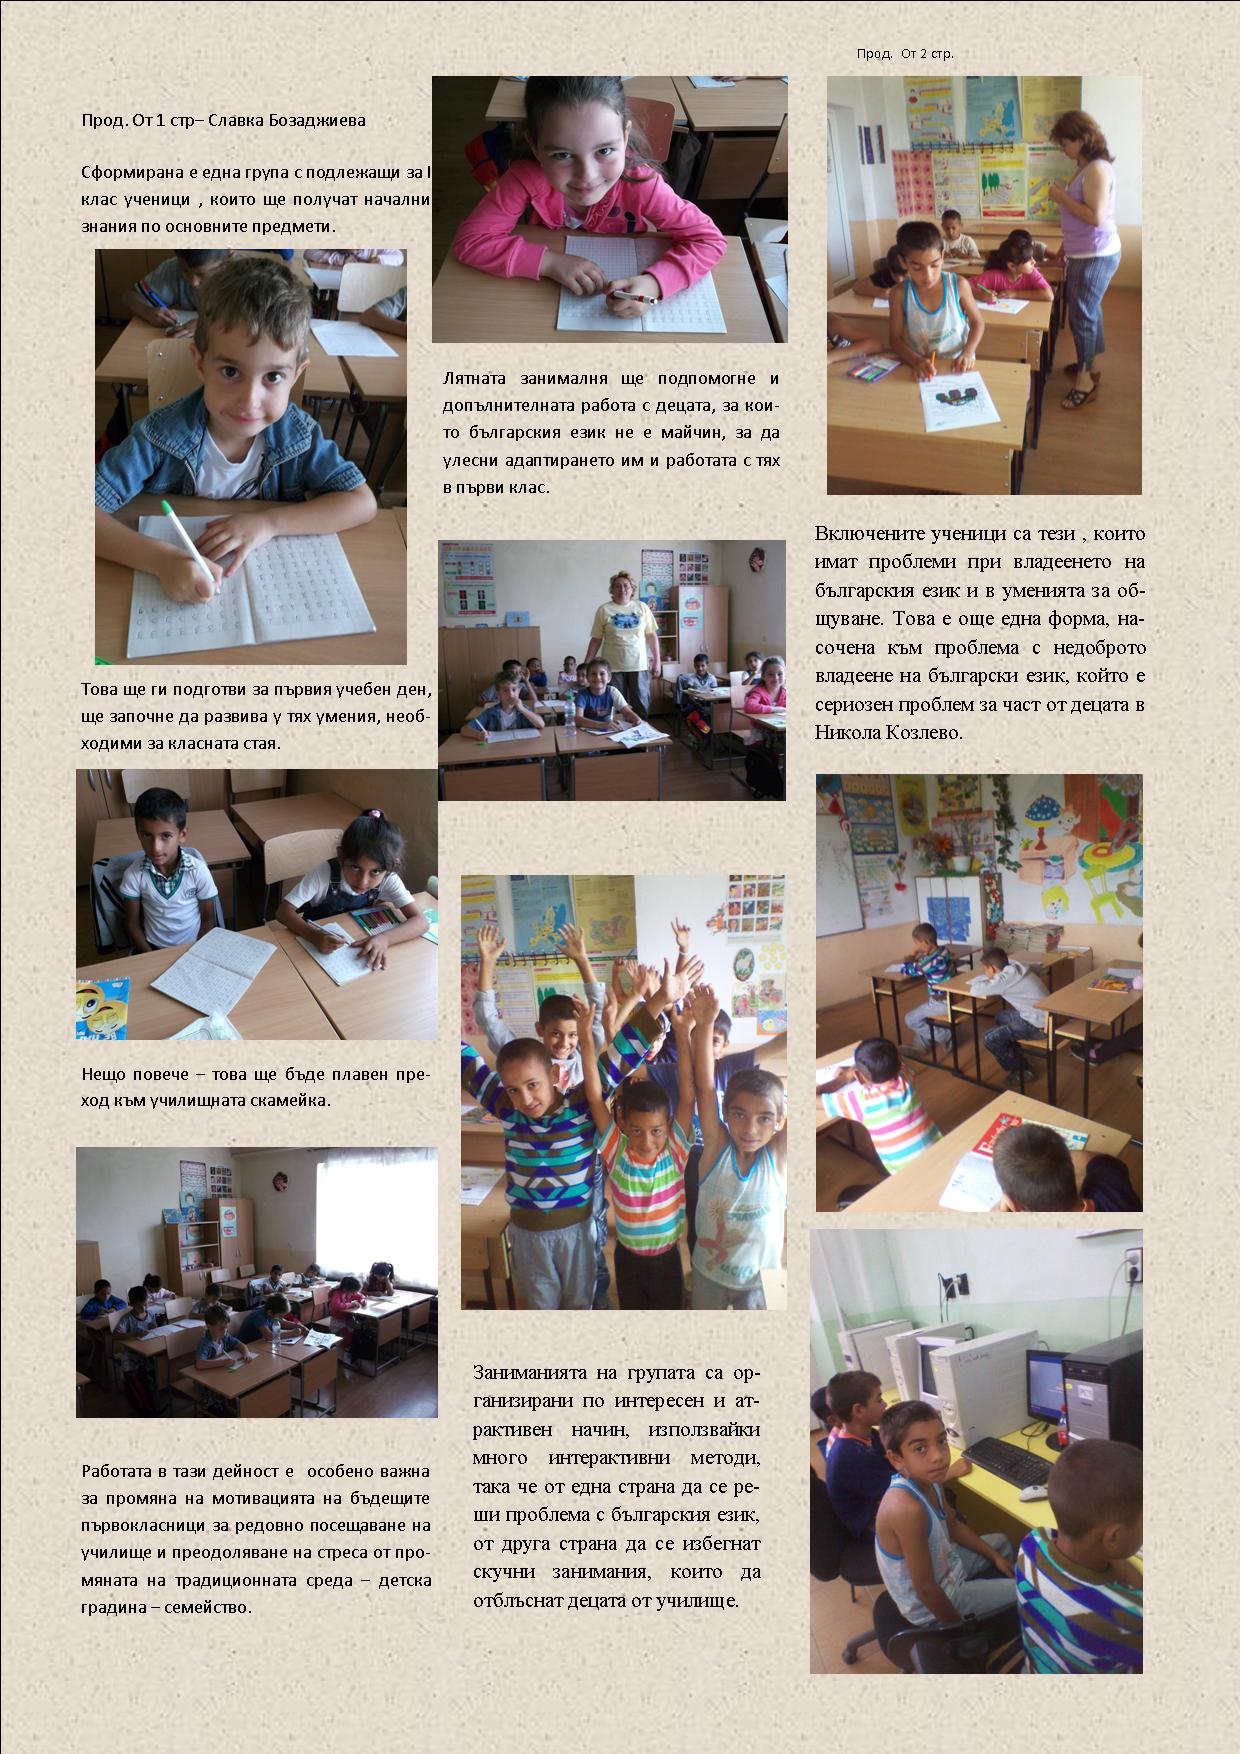 1вестник-6-ти бр-юни-стр-3- 2013